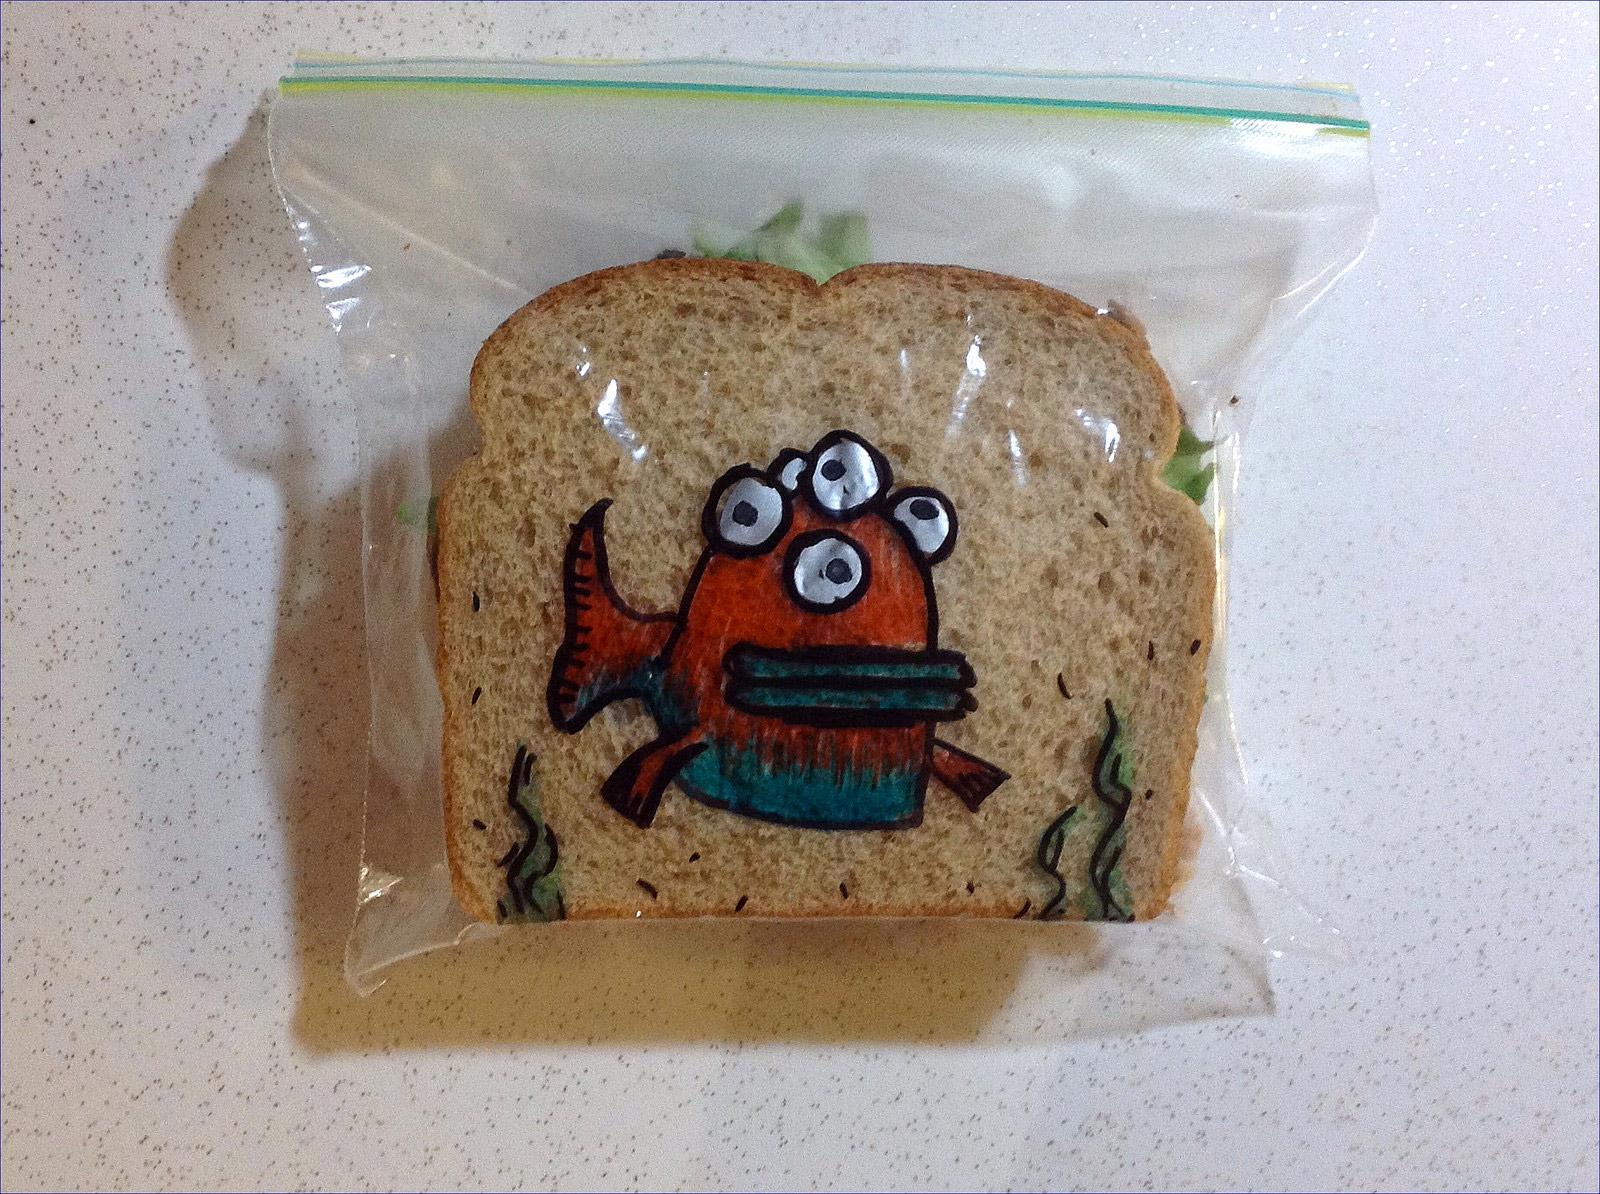 david-laferriere-creative-lunch-bag-illustration-03